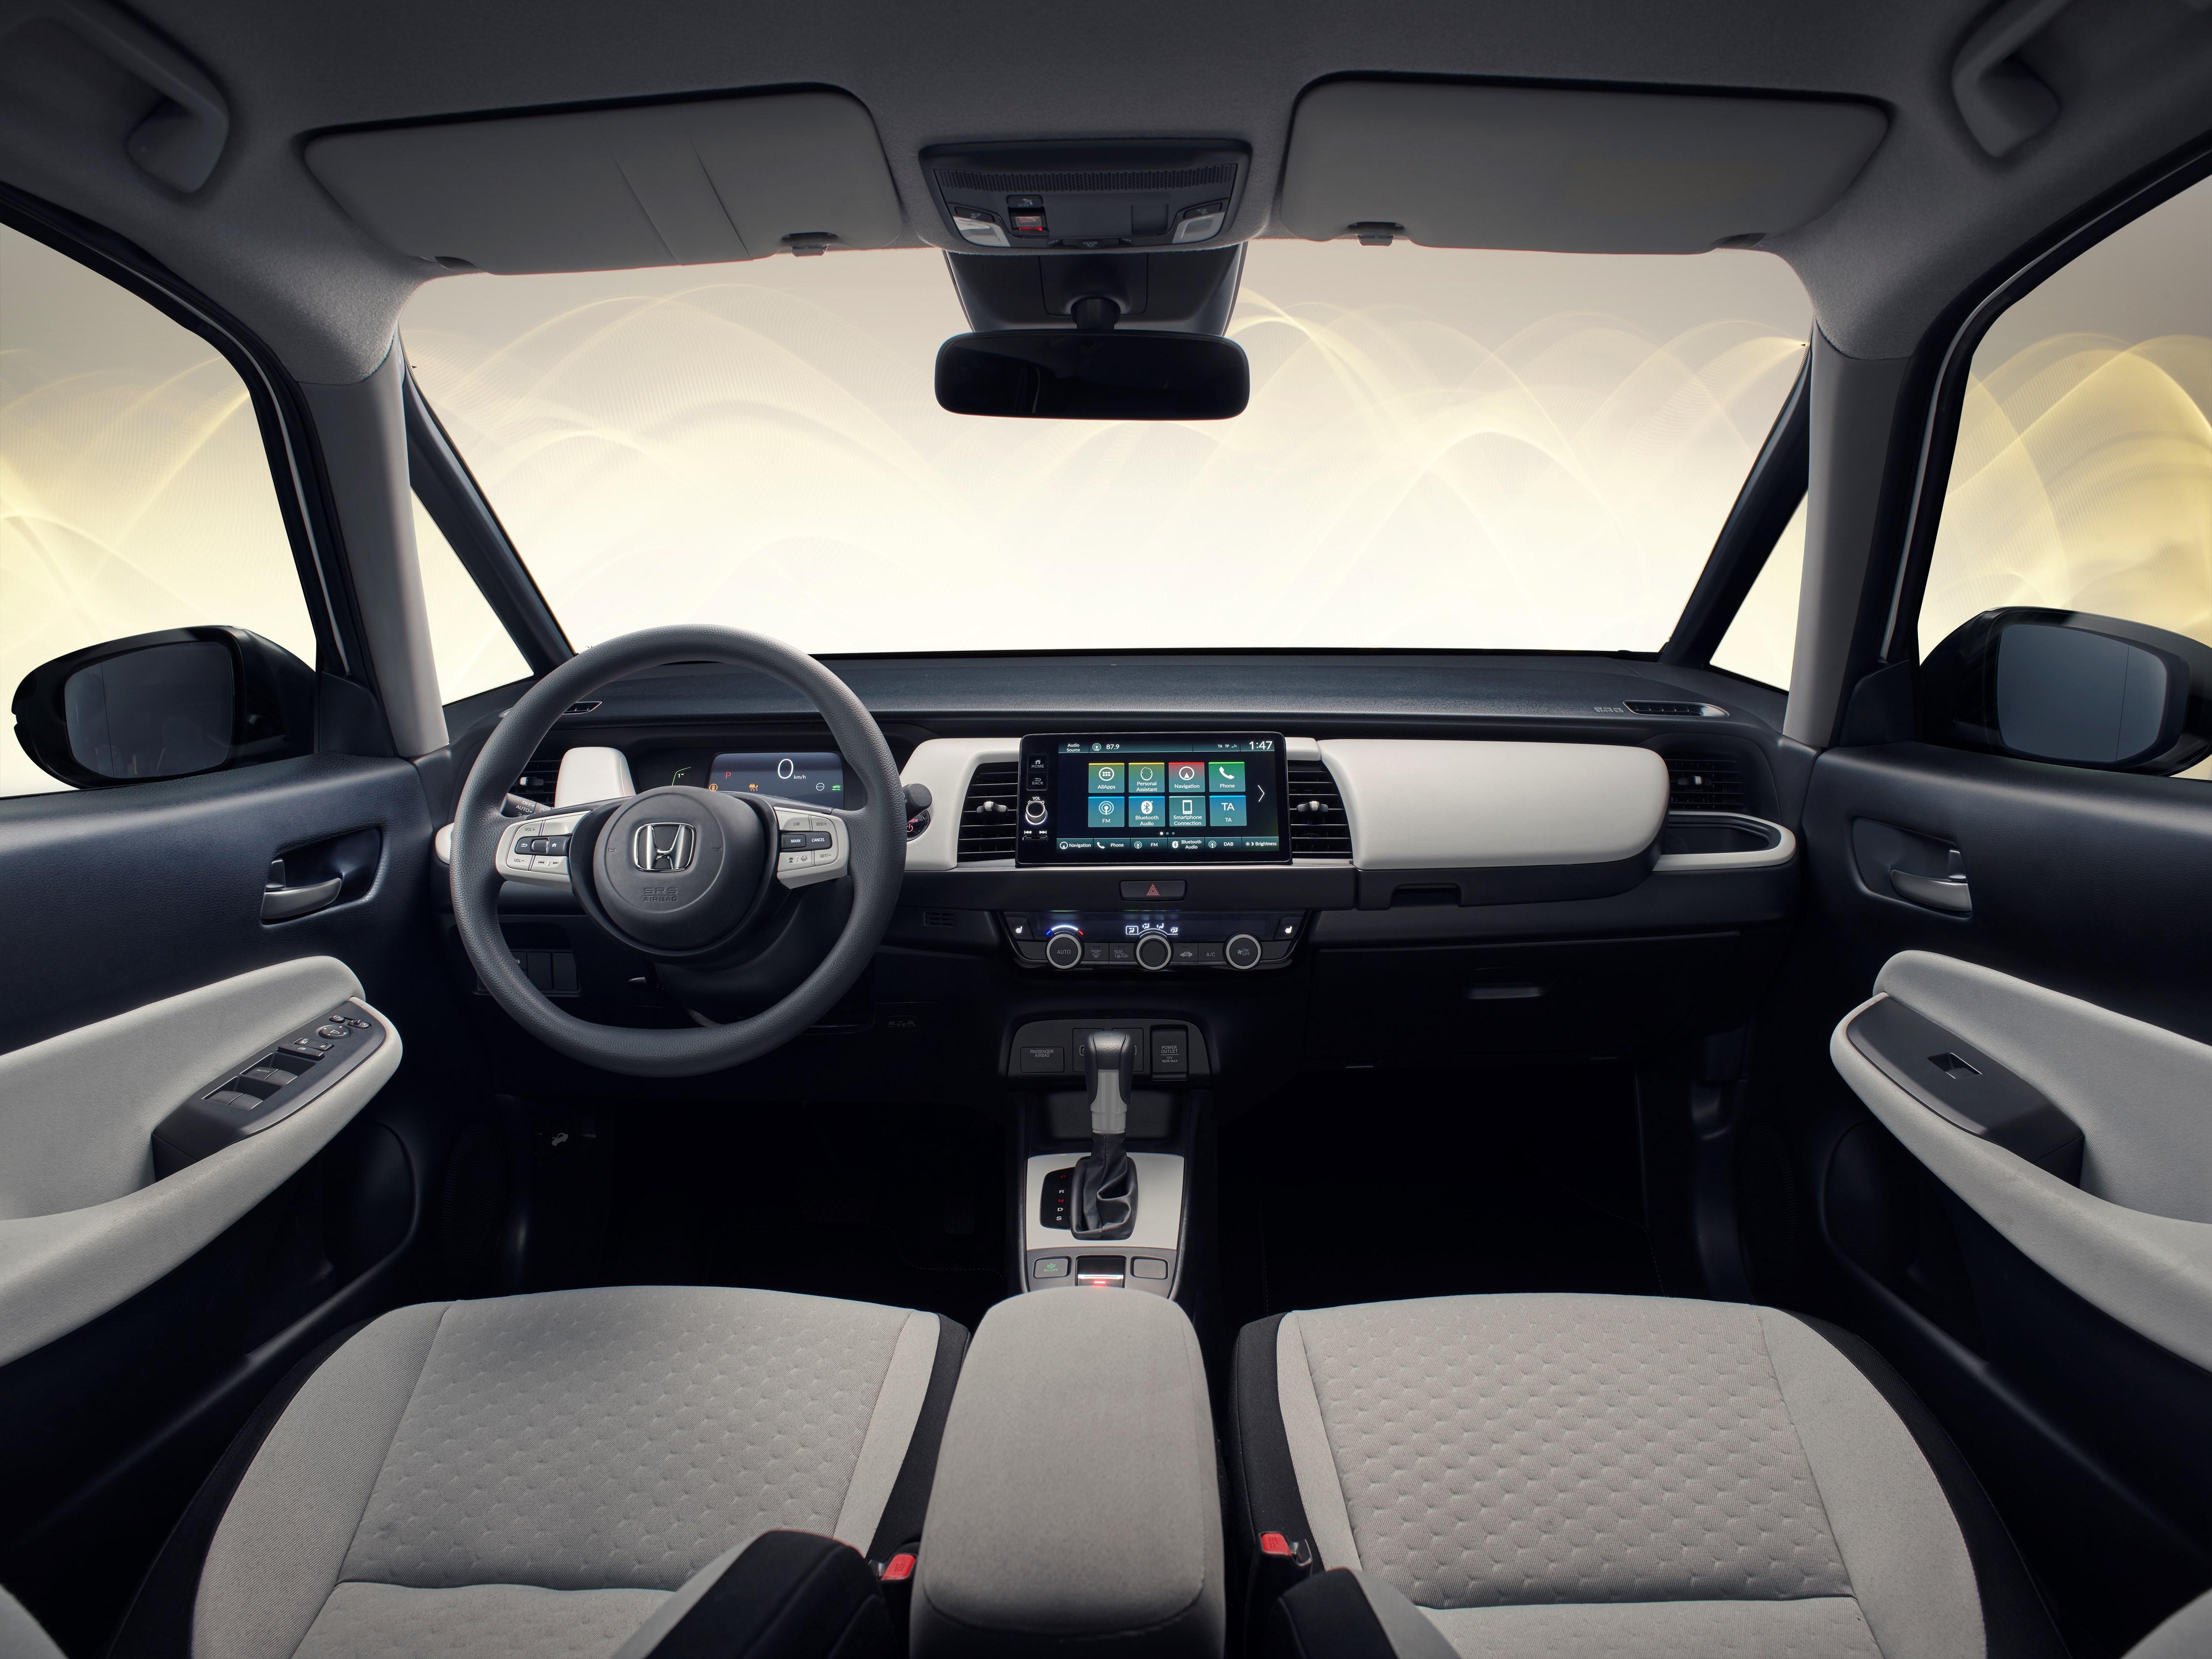 Honda Jazz Keeps The Good Stuff Adds Hybrid Tech In New Model Torque